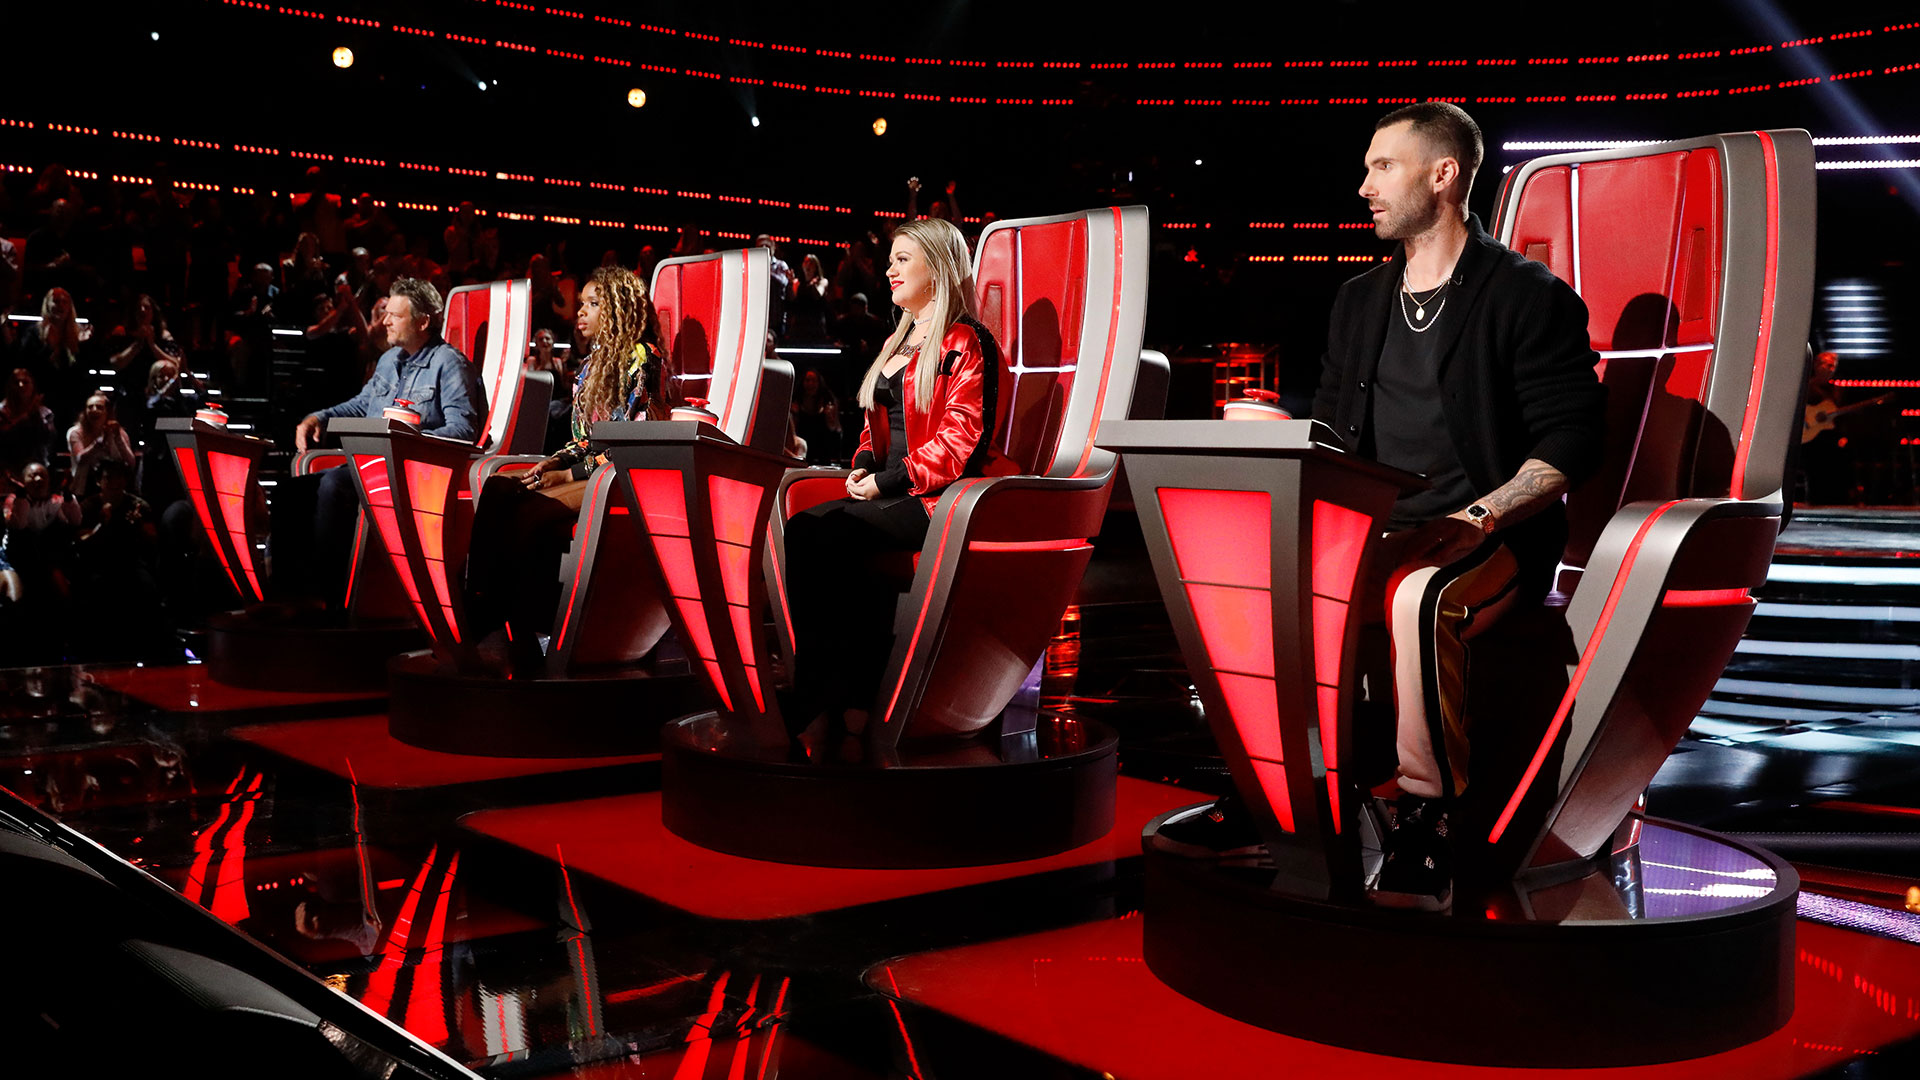 Watch The Voice Sneak Peek  First Look  The Voice Season 15